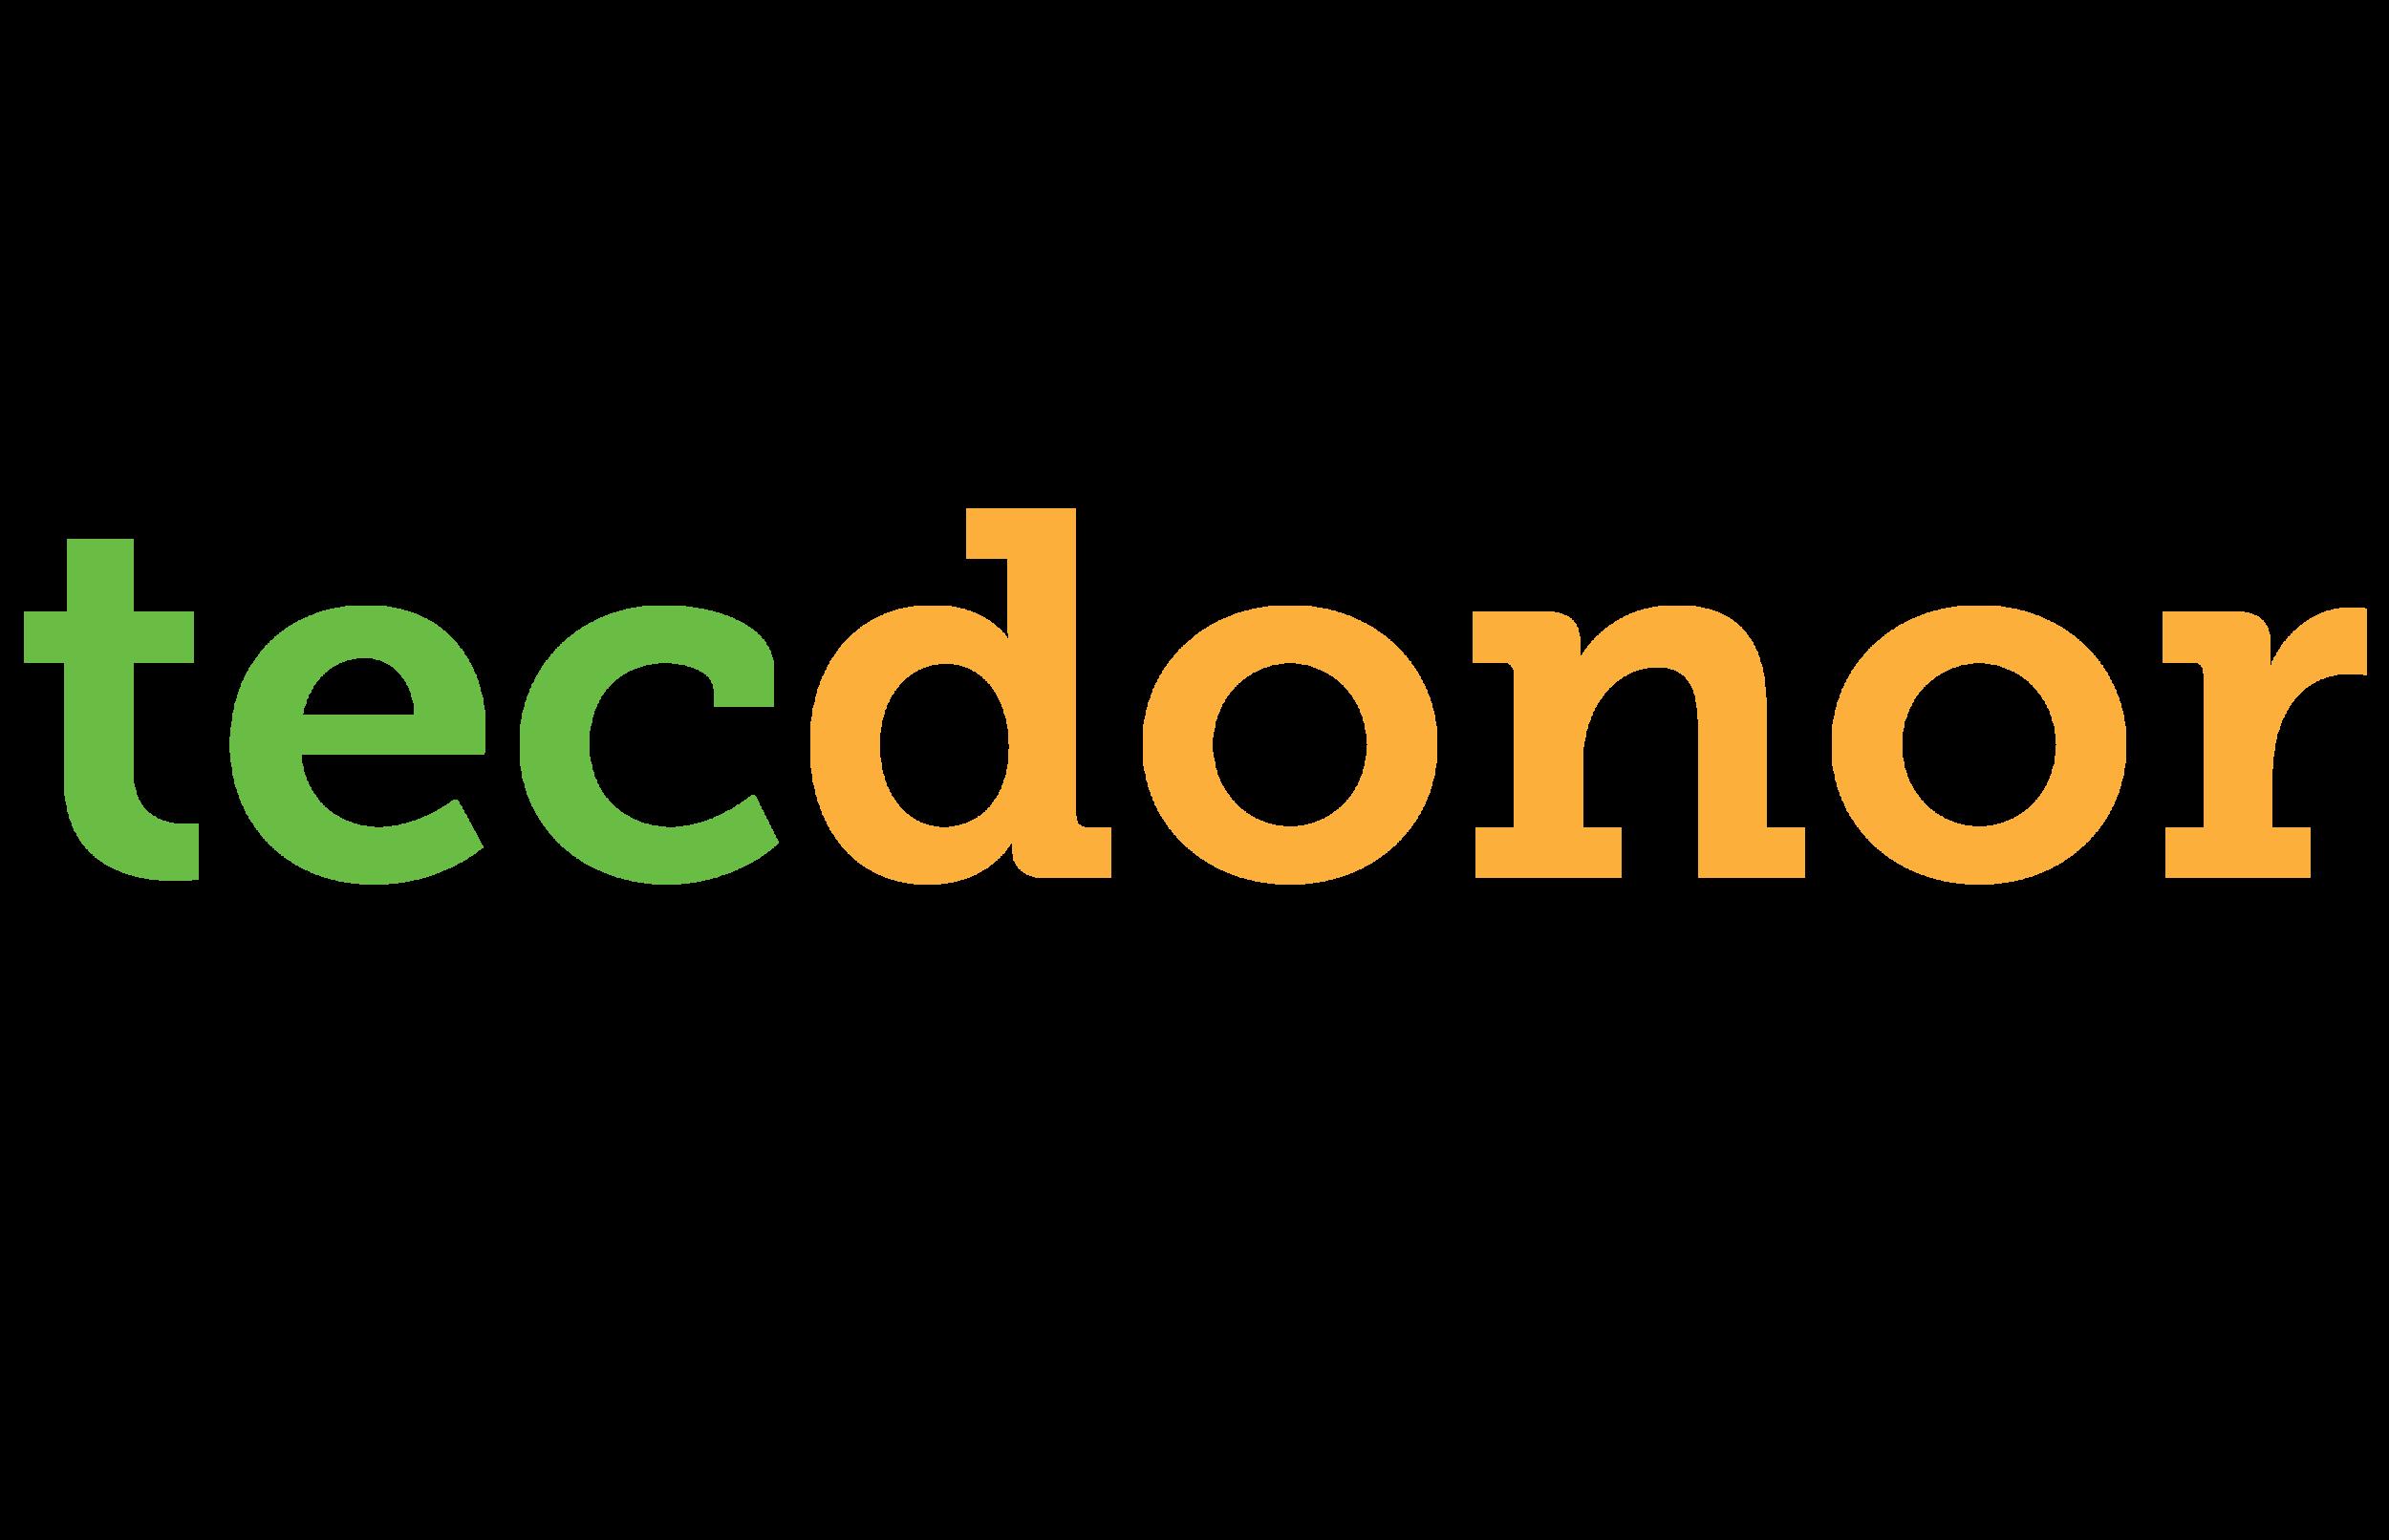 Tecdonor Logo.png